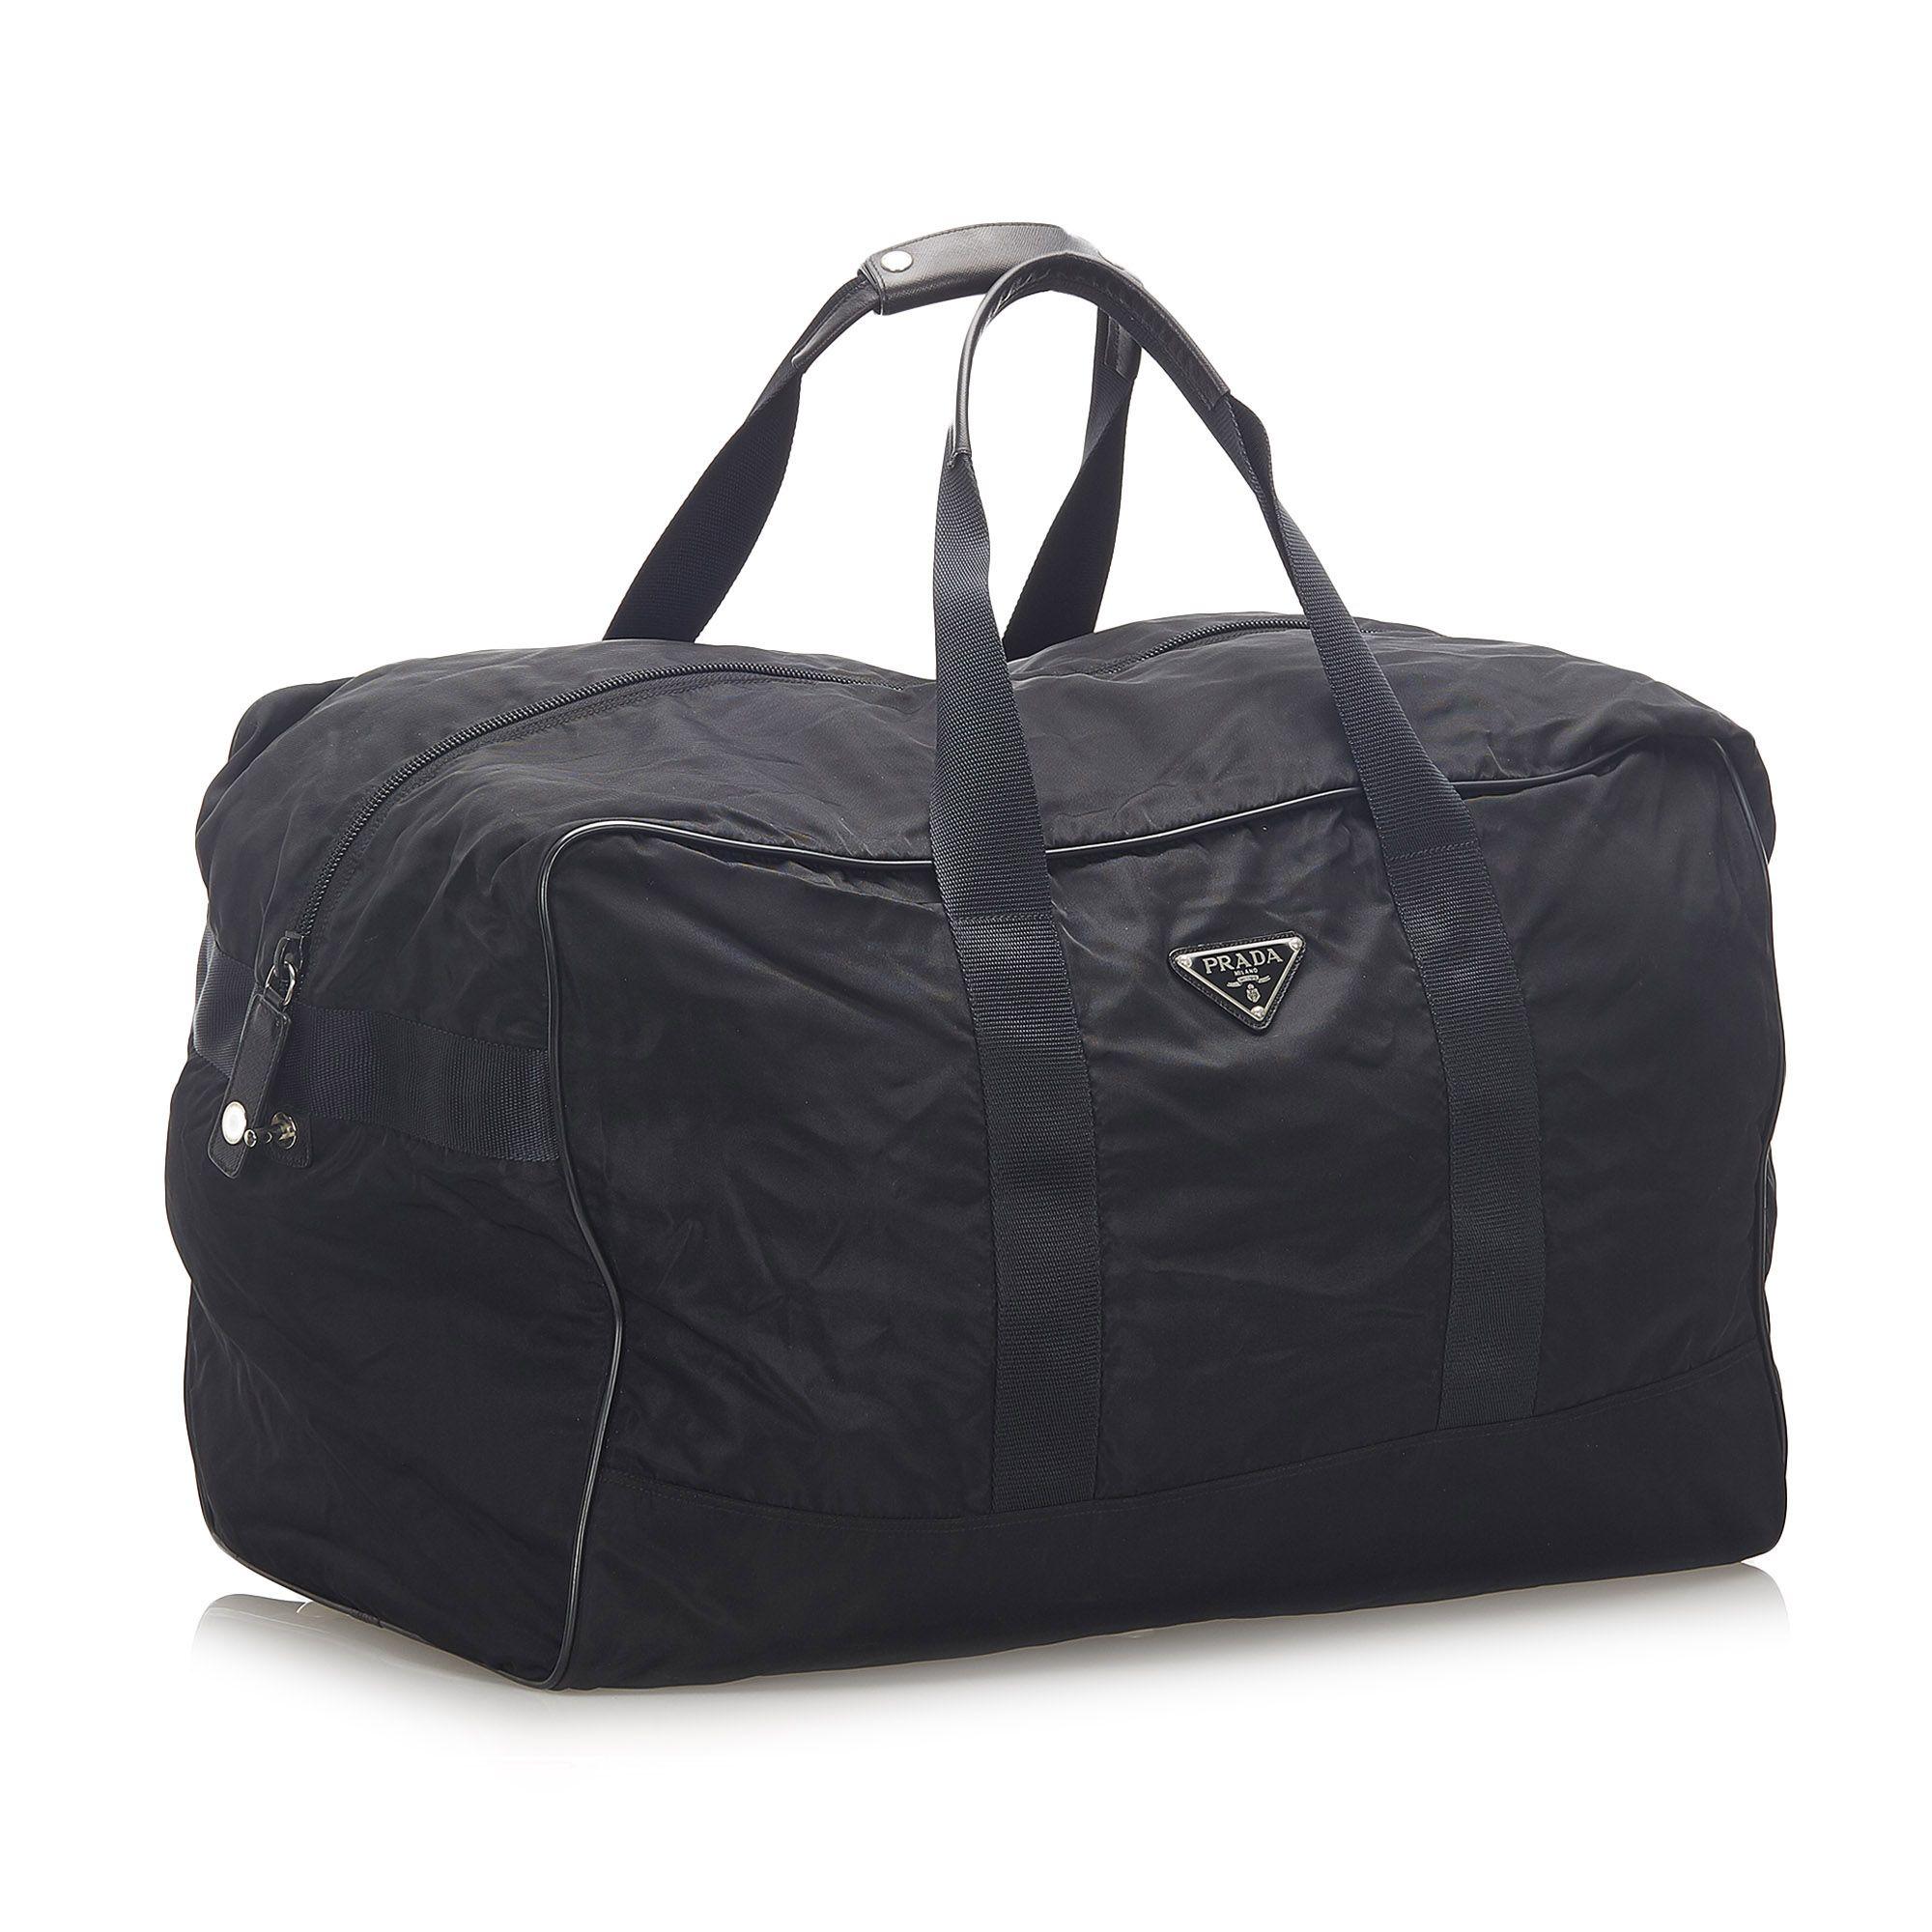 Vintage Prada Tessuto Travel Bag Black